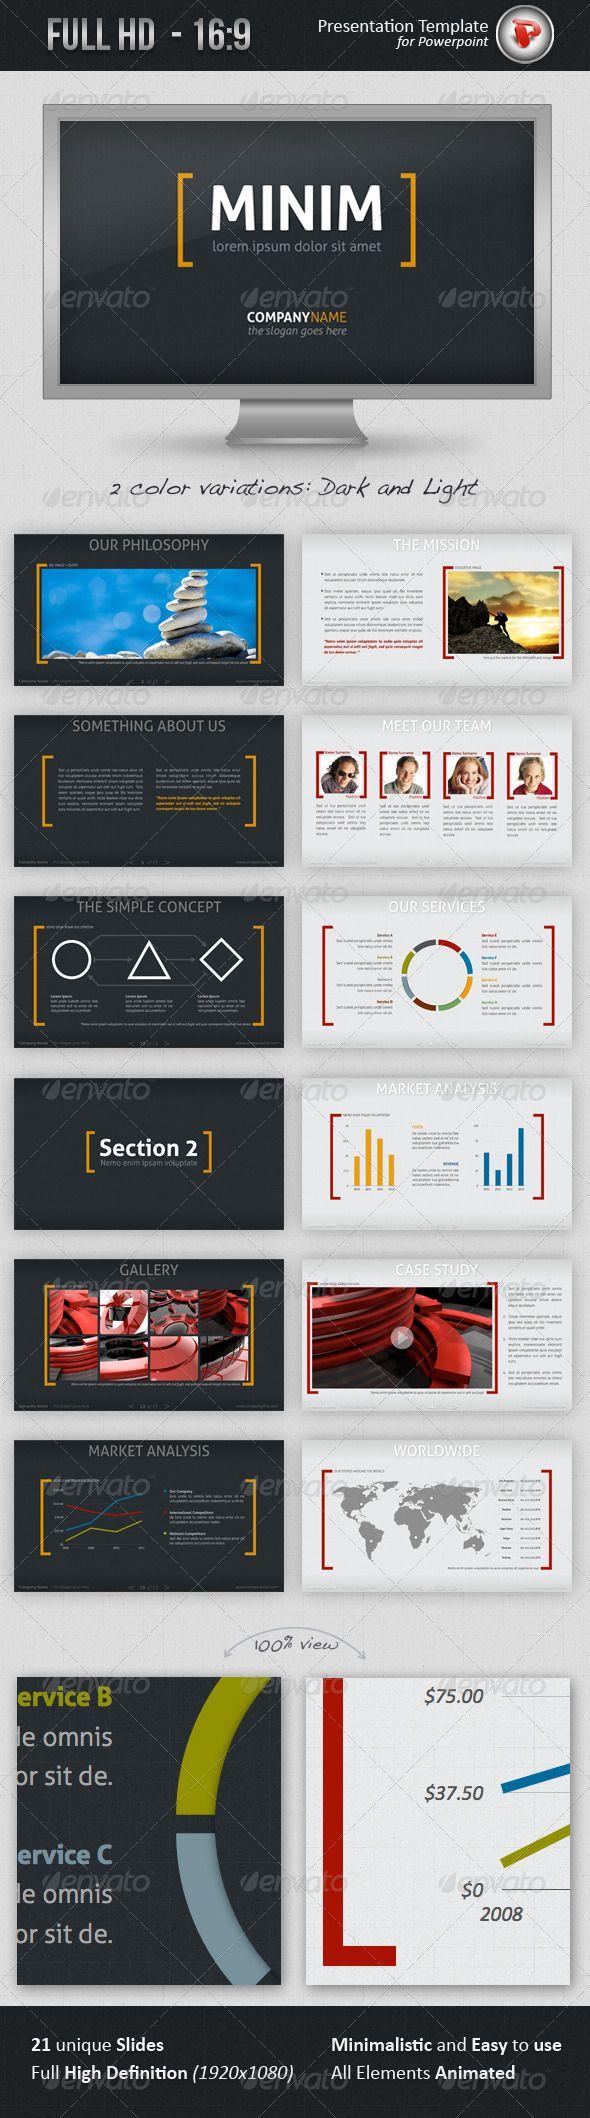 Minim Powerpoint Template